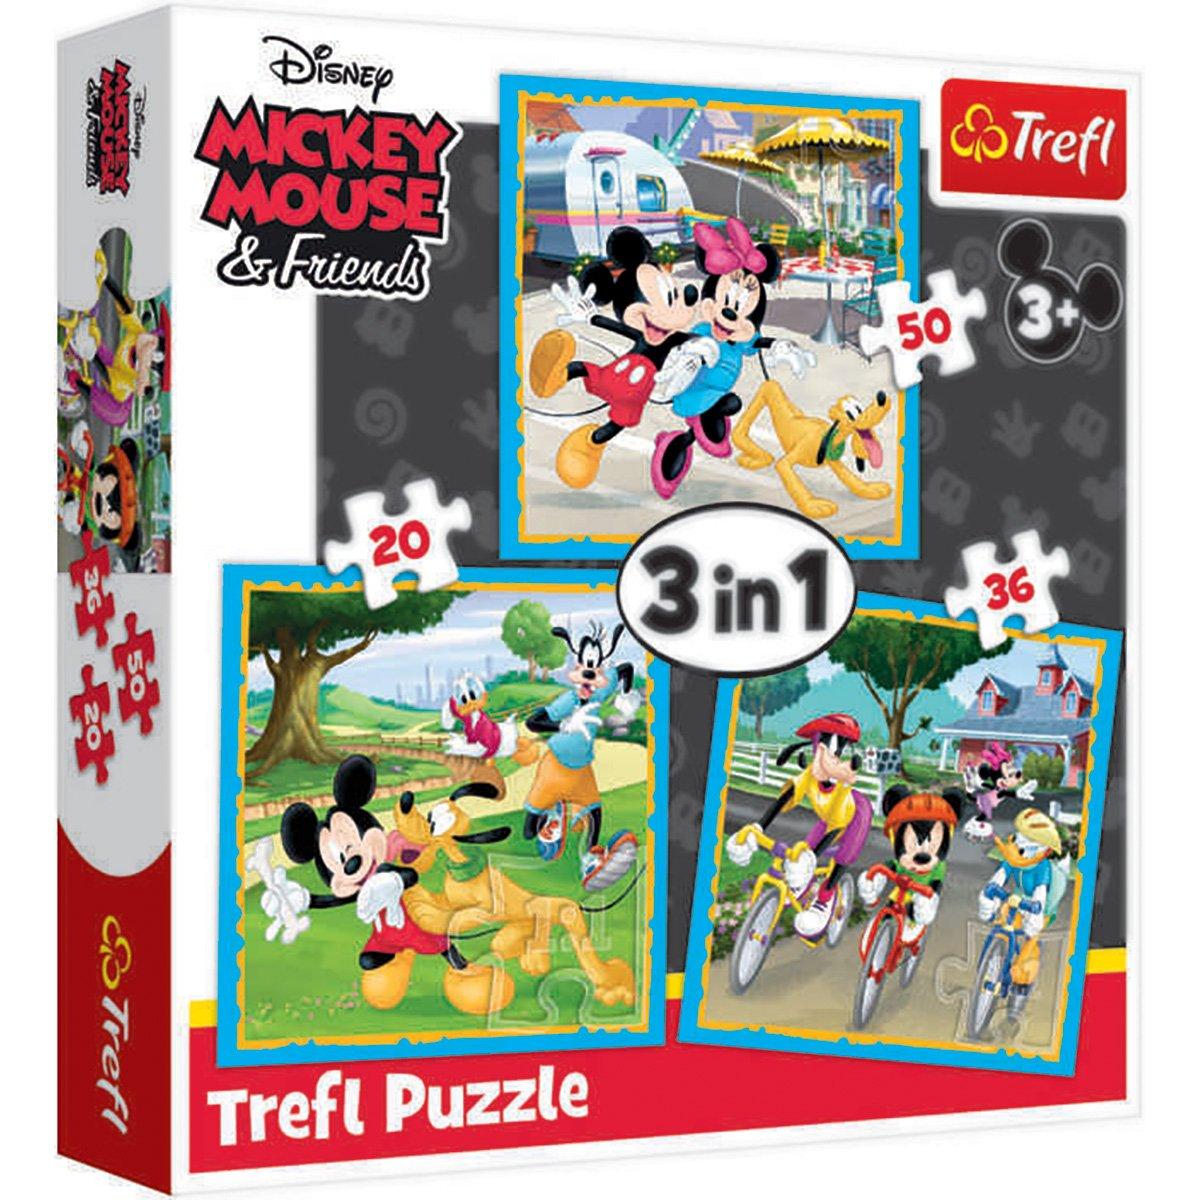 Puzzle 3 in 1 Trefl, Mickey Mouse si prietenii (20, 36, 50 piese)